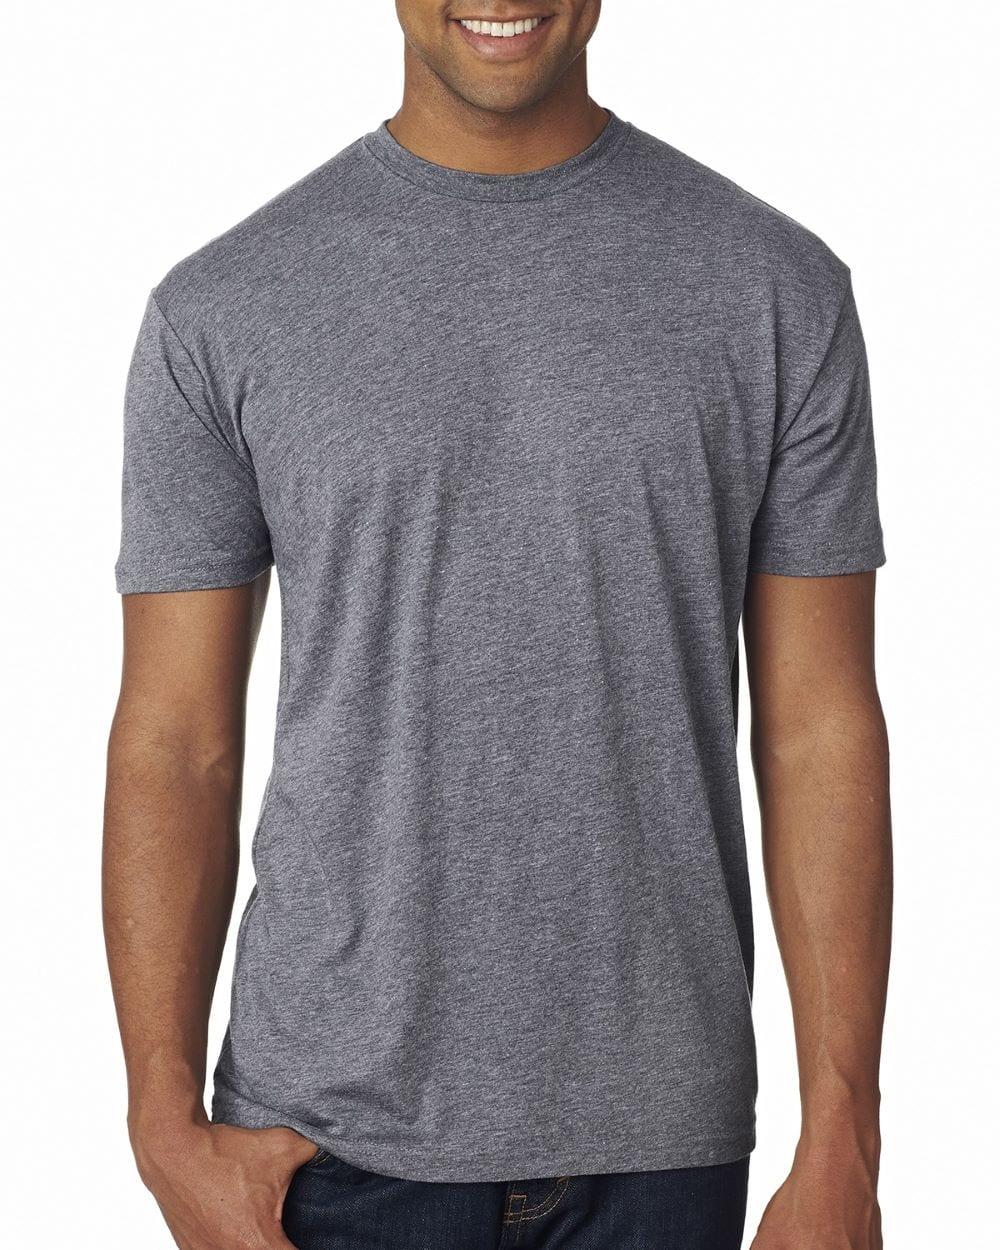 0700c0fb bulk custom shirts next level 6010 custom triblend crew 4.3 oz t shirt  premium heather